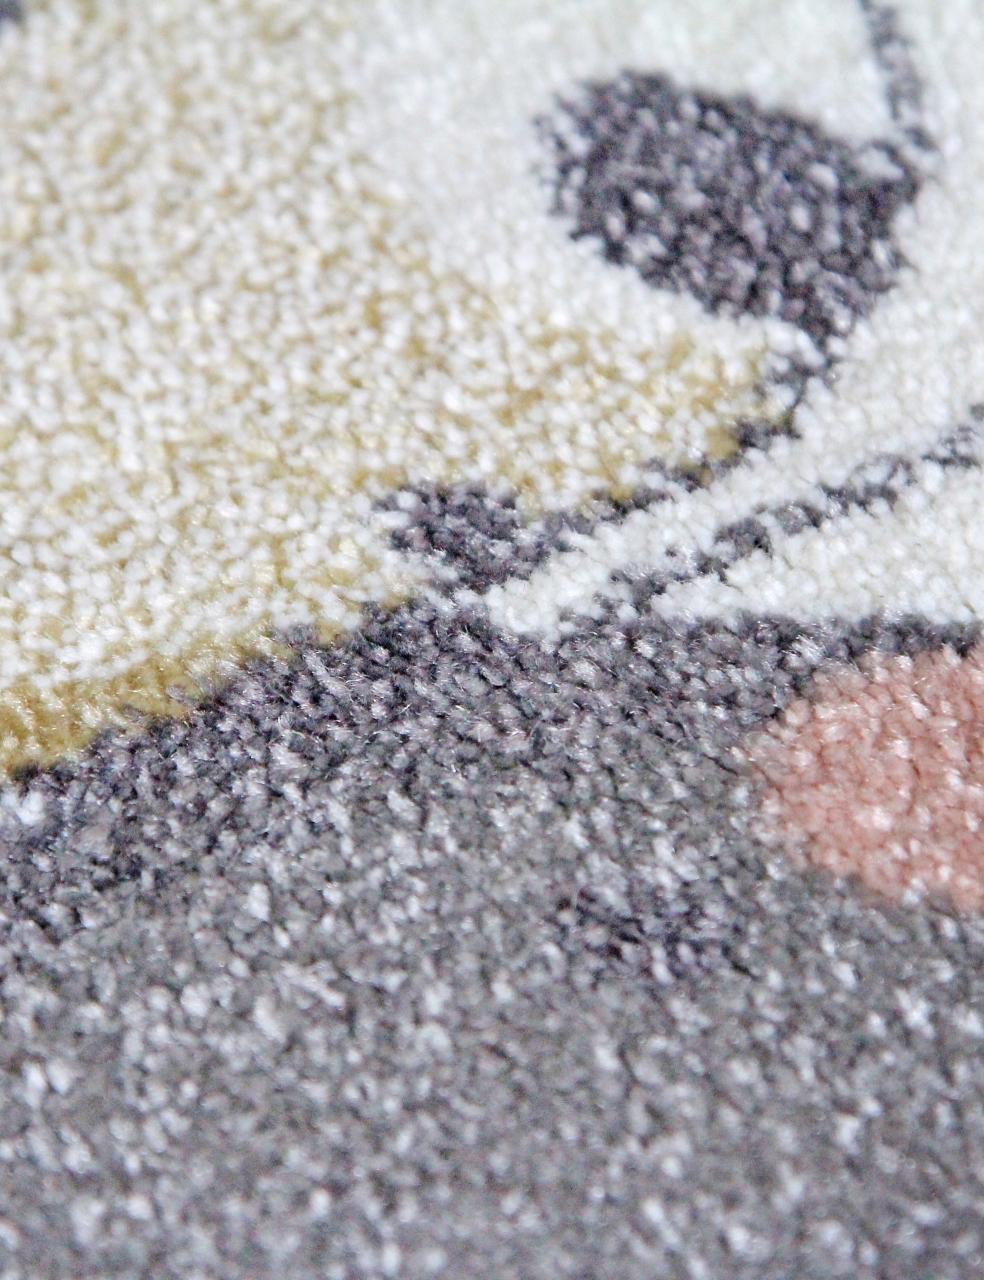 Ковер 2922 - LIGHT PURPLE - Прямоугольник - коллекция SOFIT - фото 4